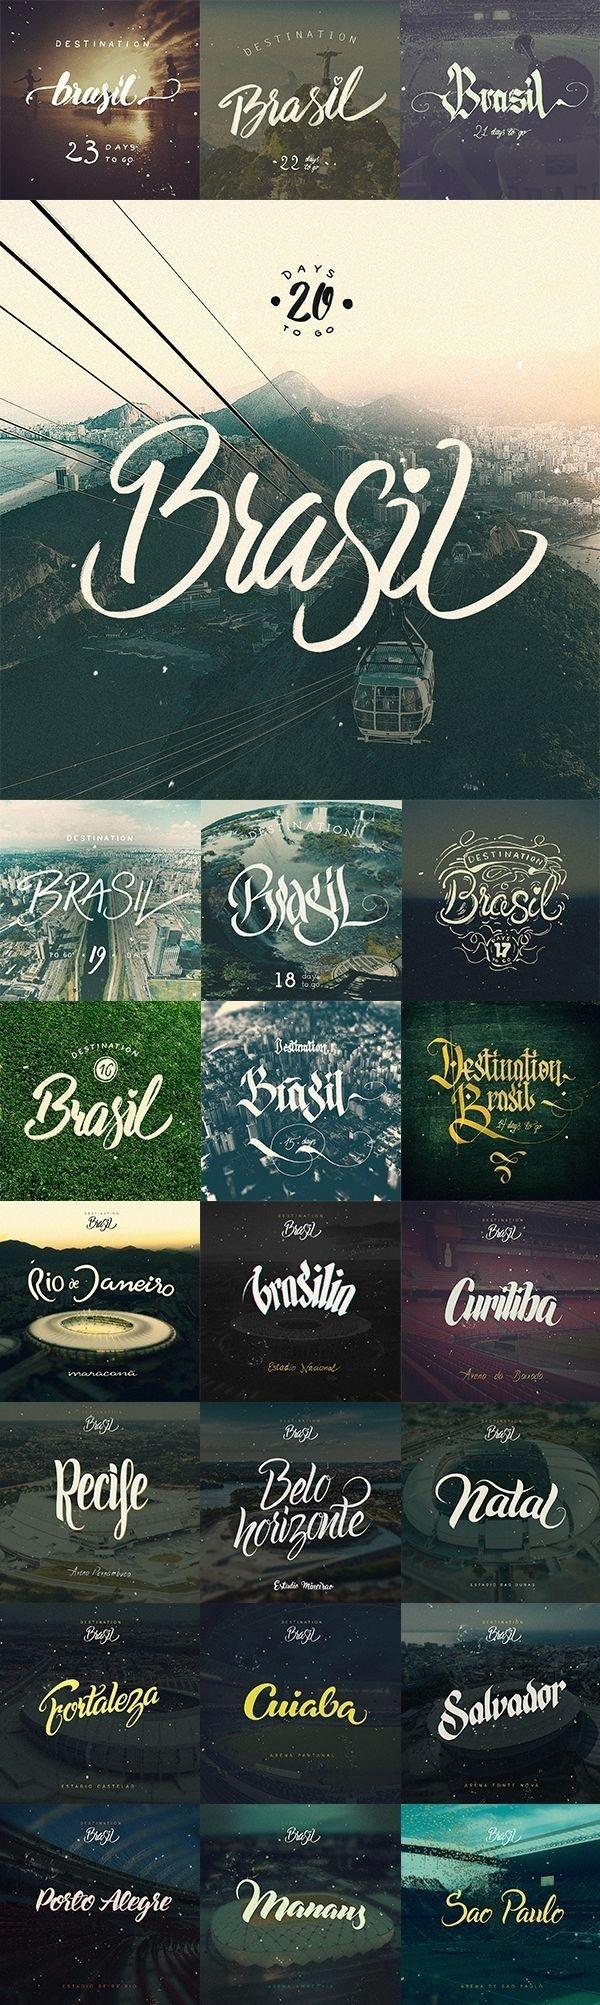 Destination Brasil by Arkadiusz Radek #inspiration #lettering #world #fifa #brasil #2014 #cup #typography